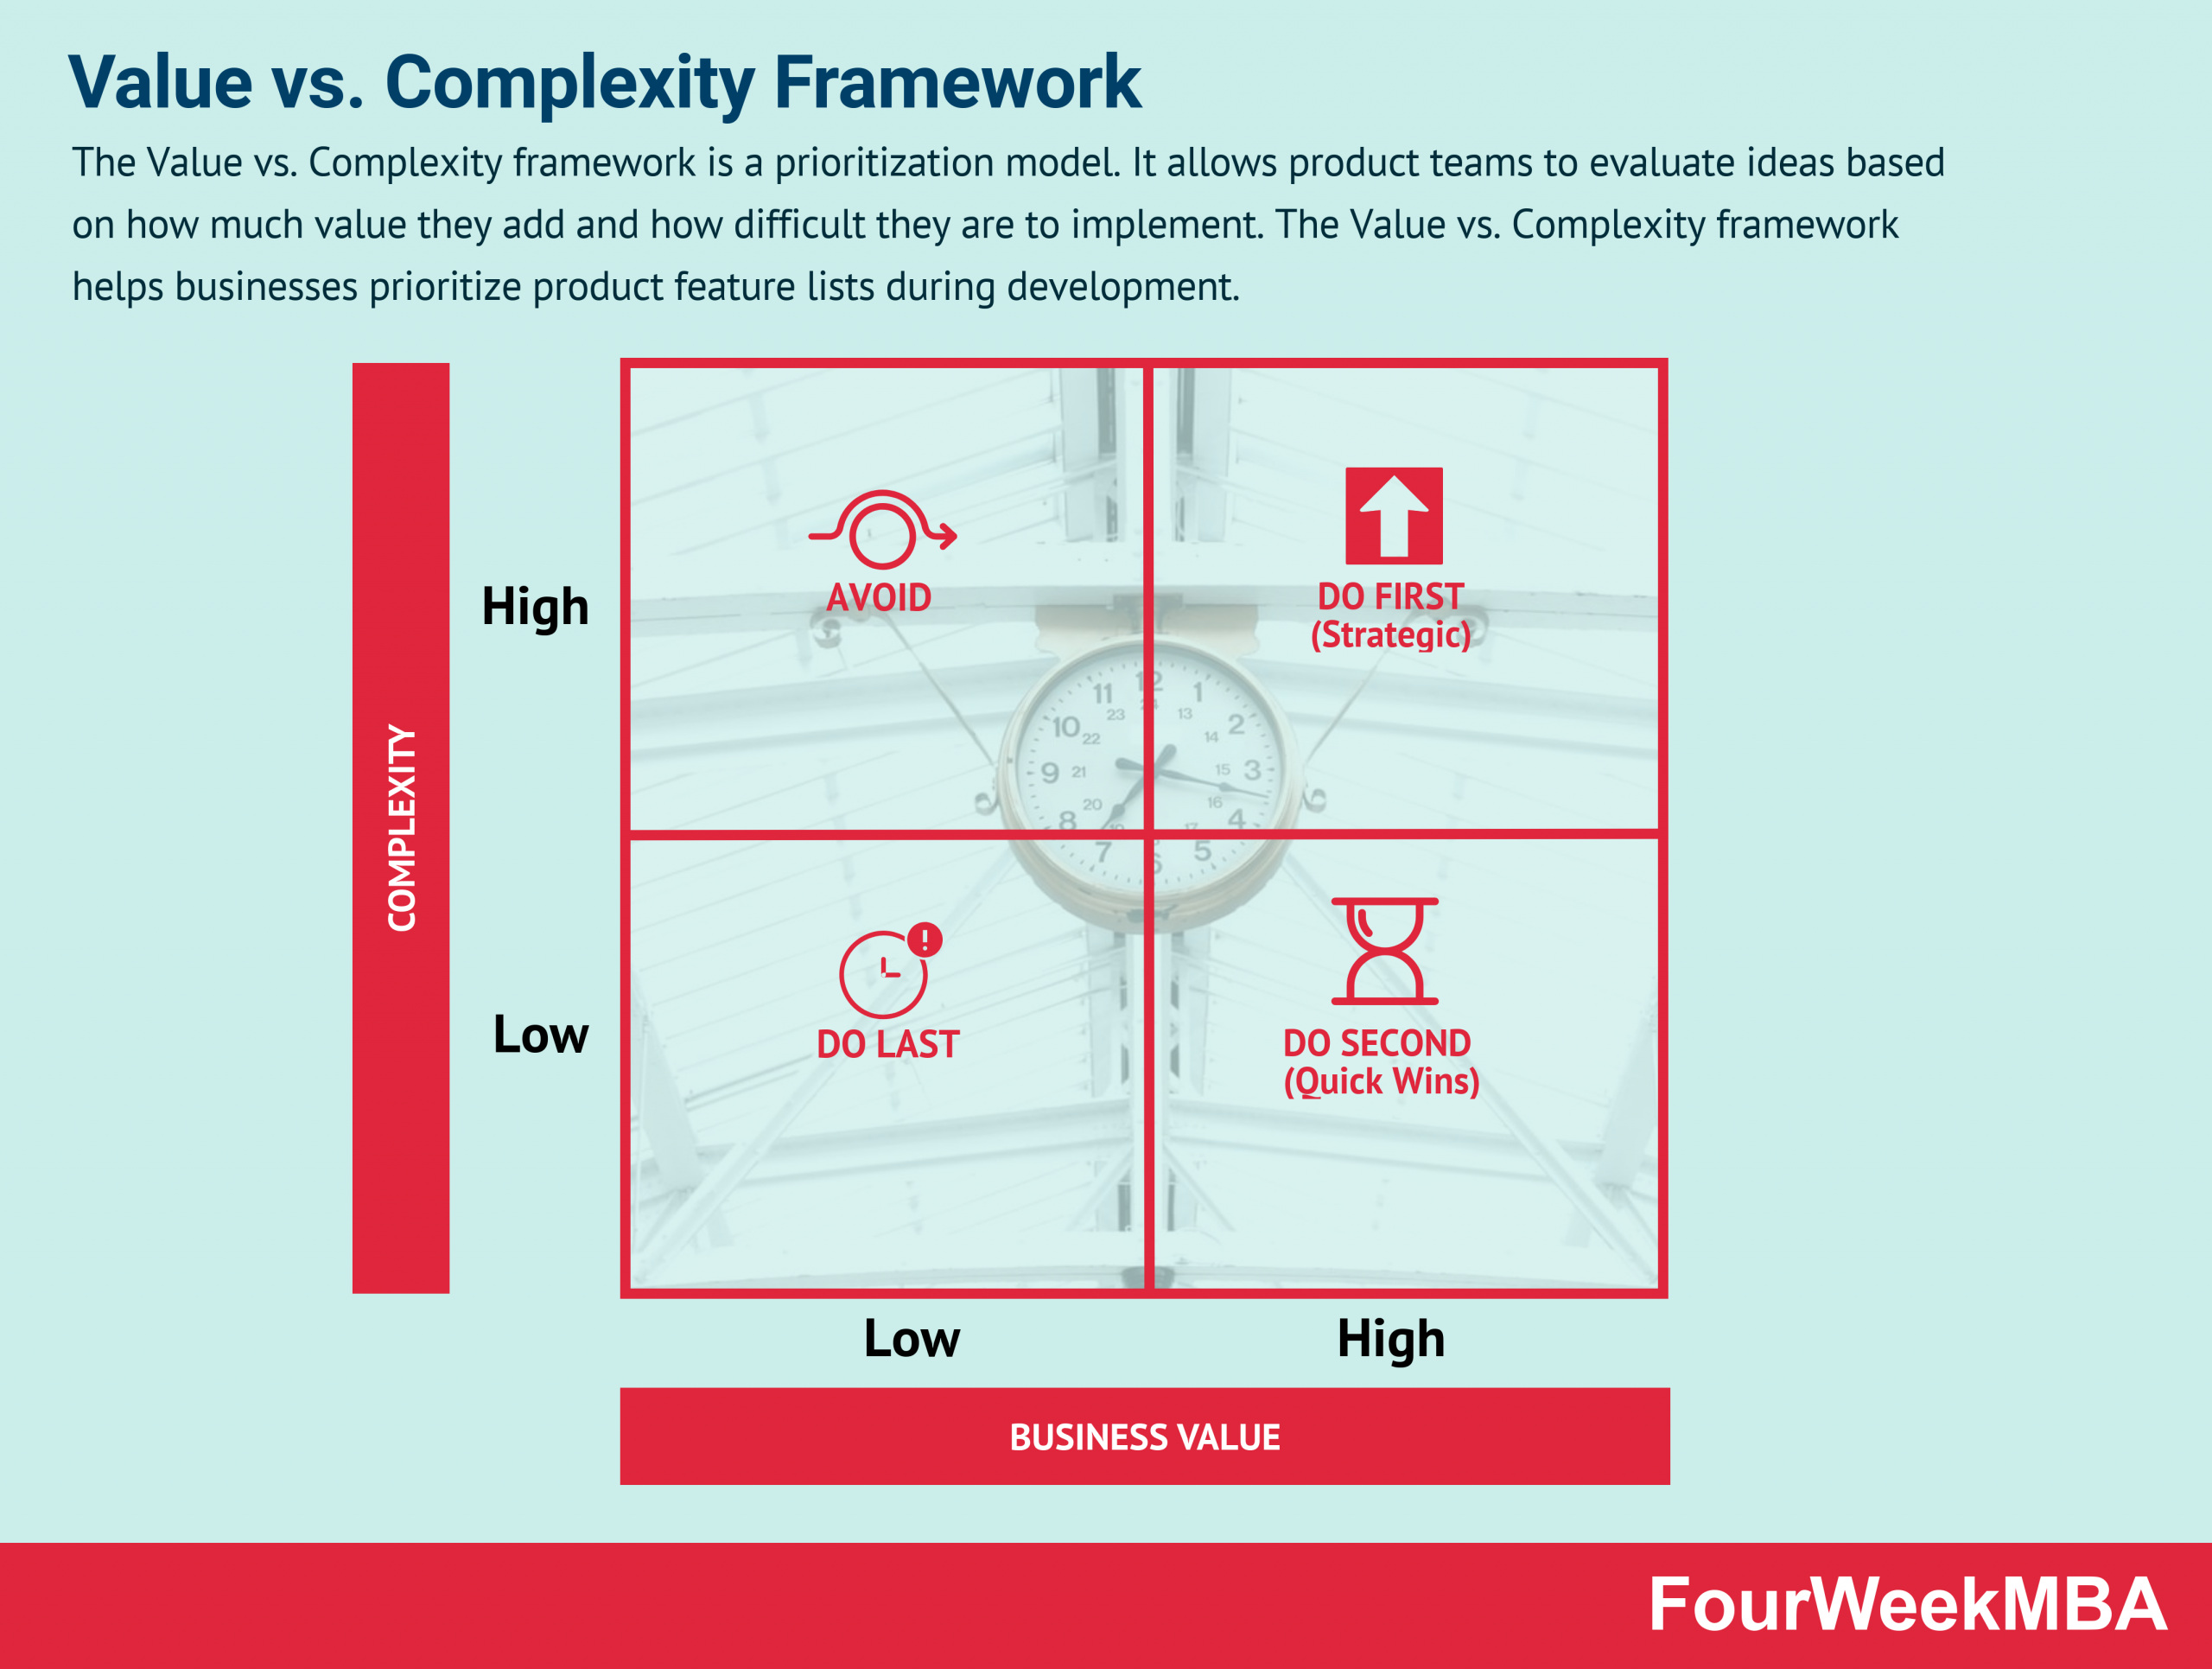 Value vs. Complexity Framework